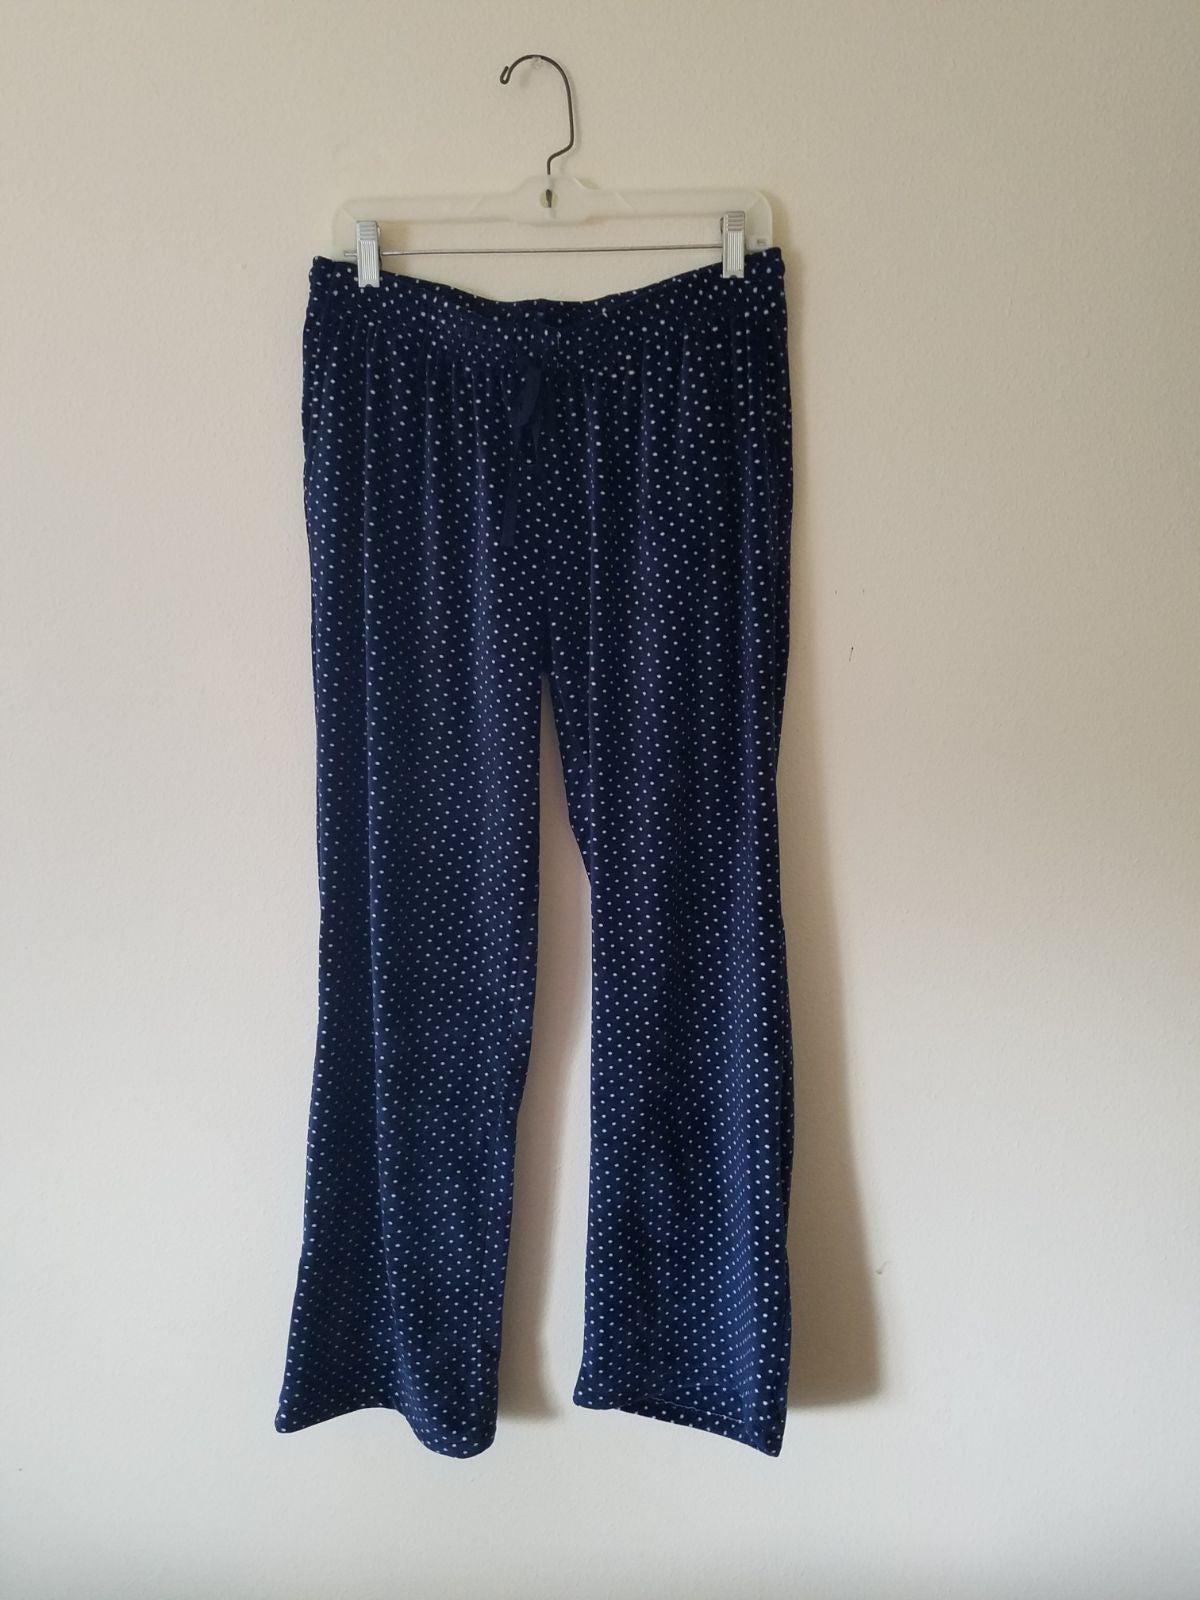 Blue fuzzy pants